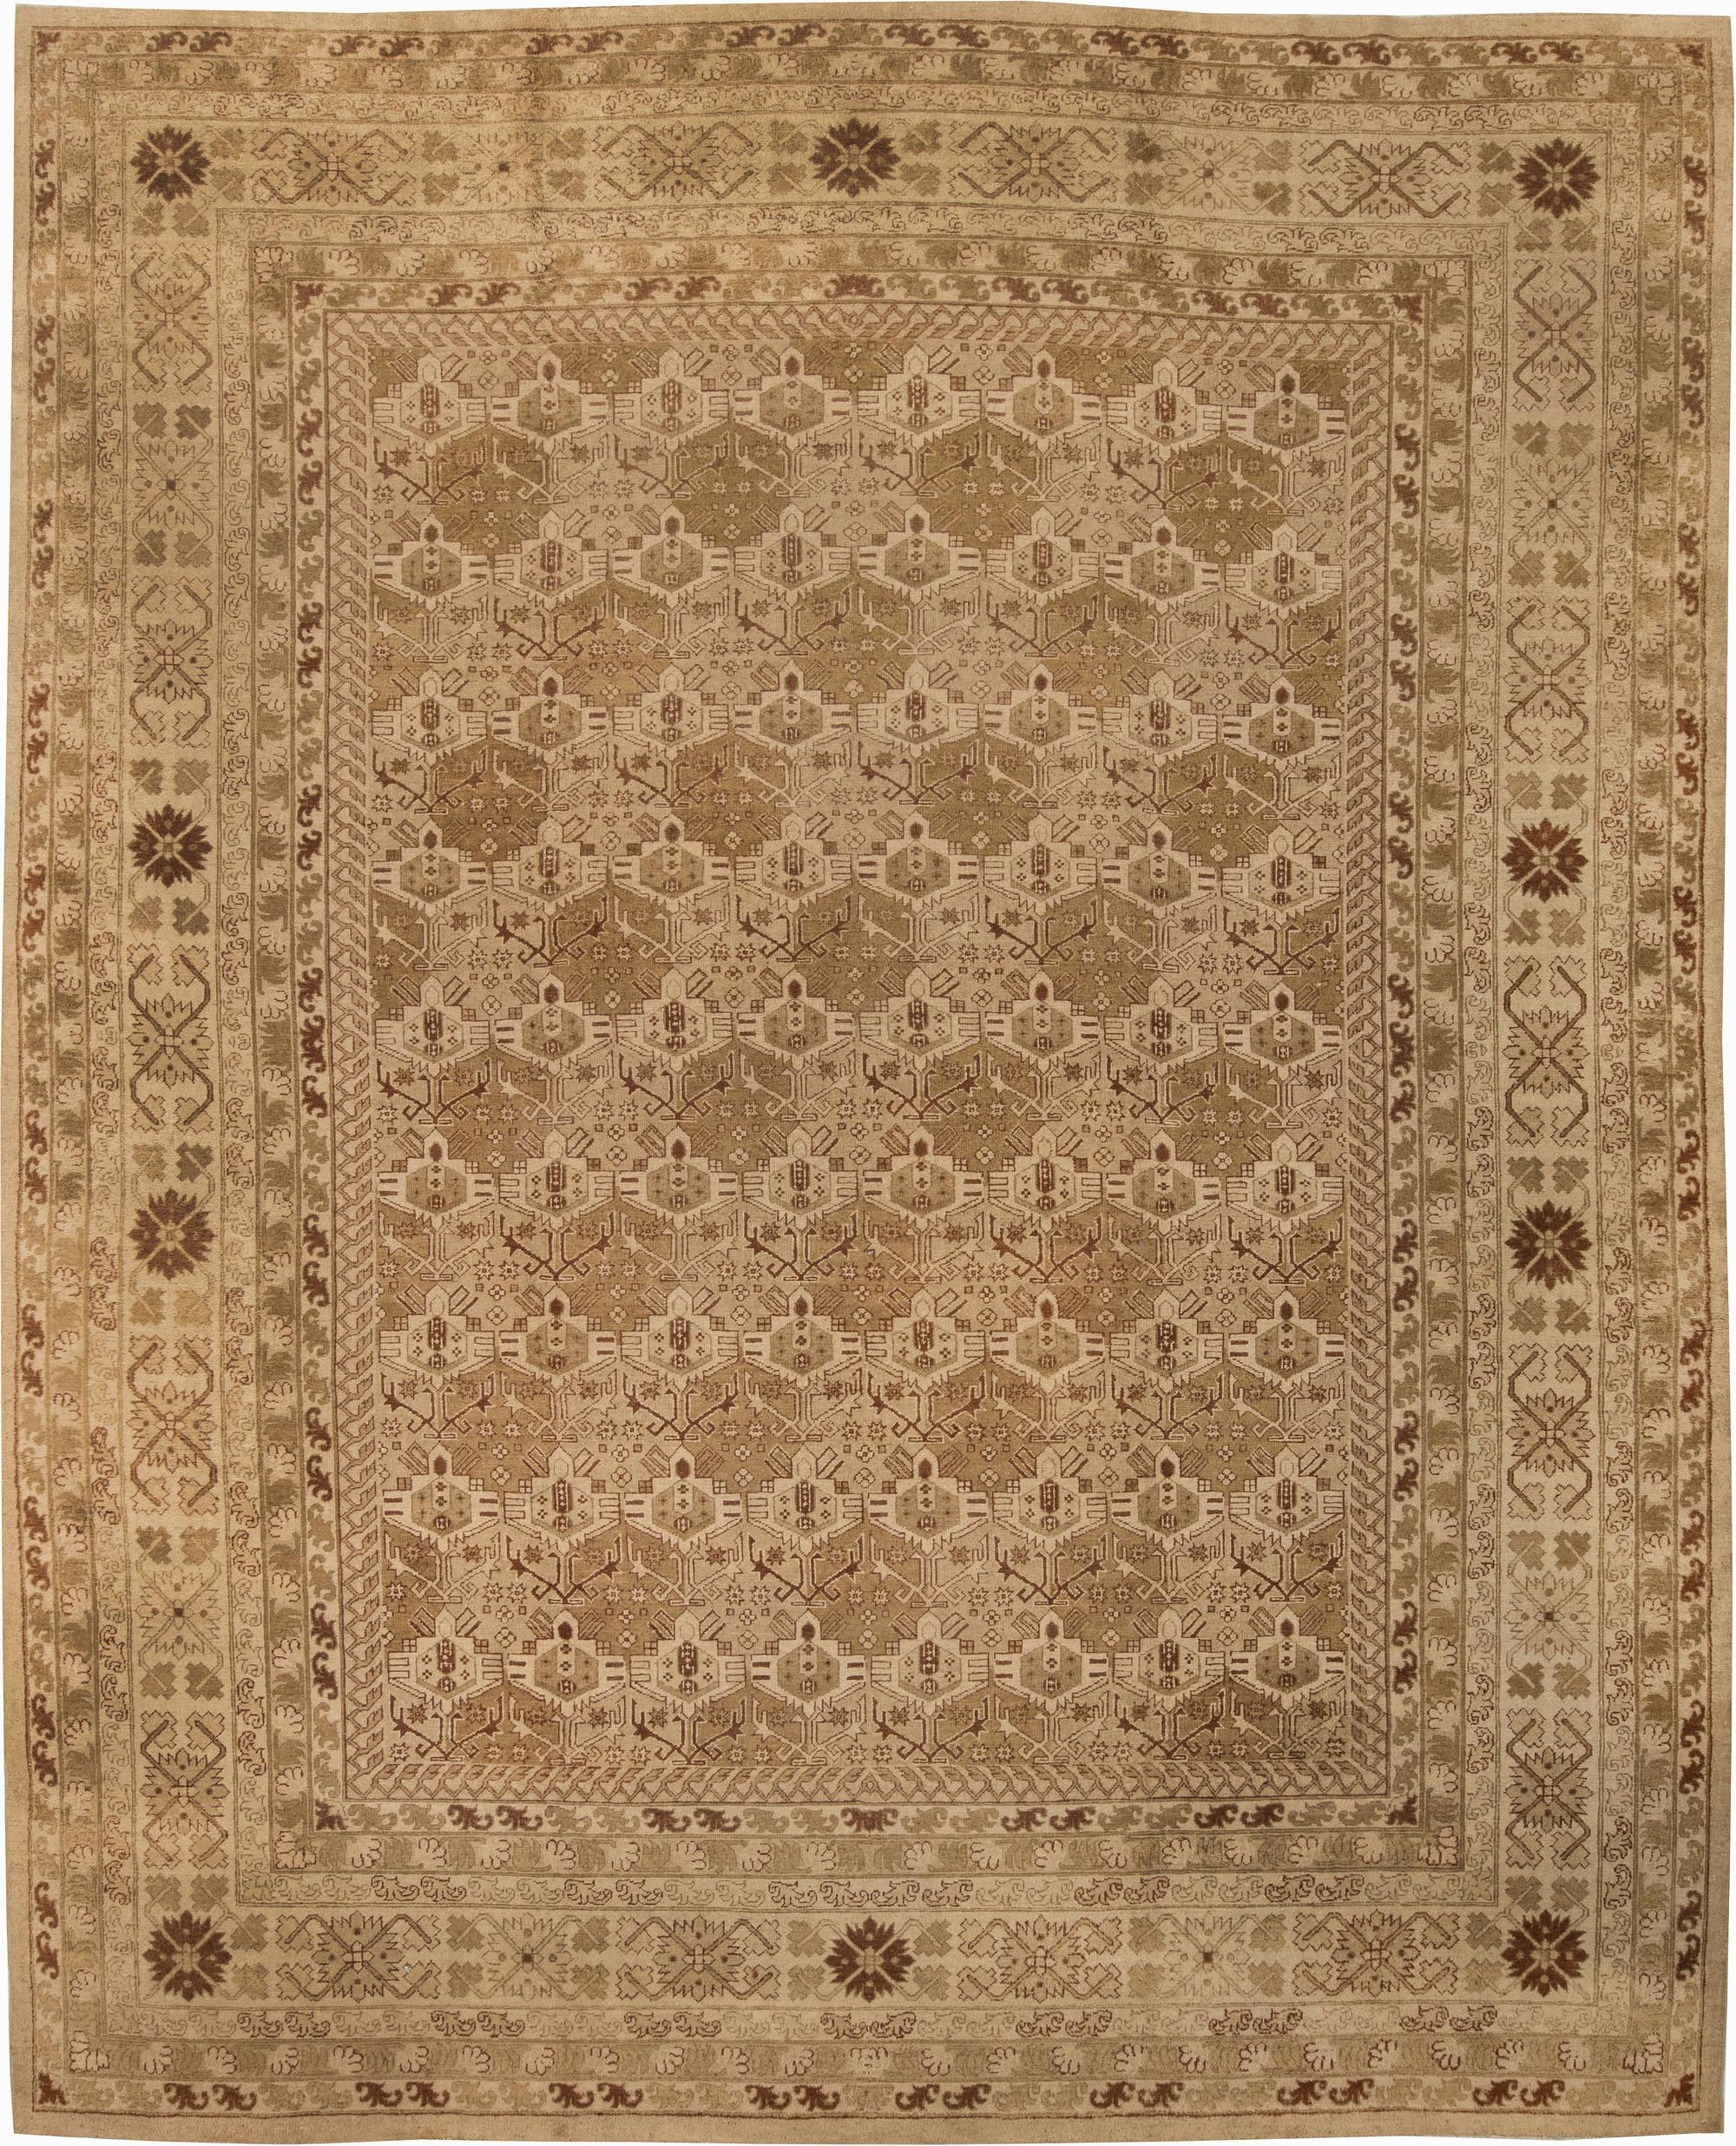 Antique Indian Amritsar Carpet BB4095